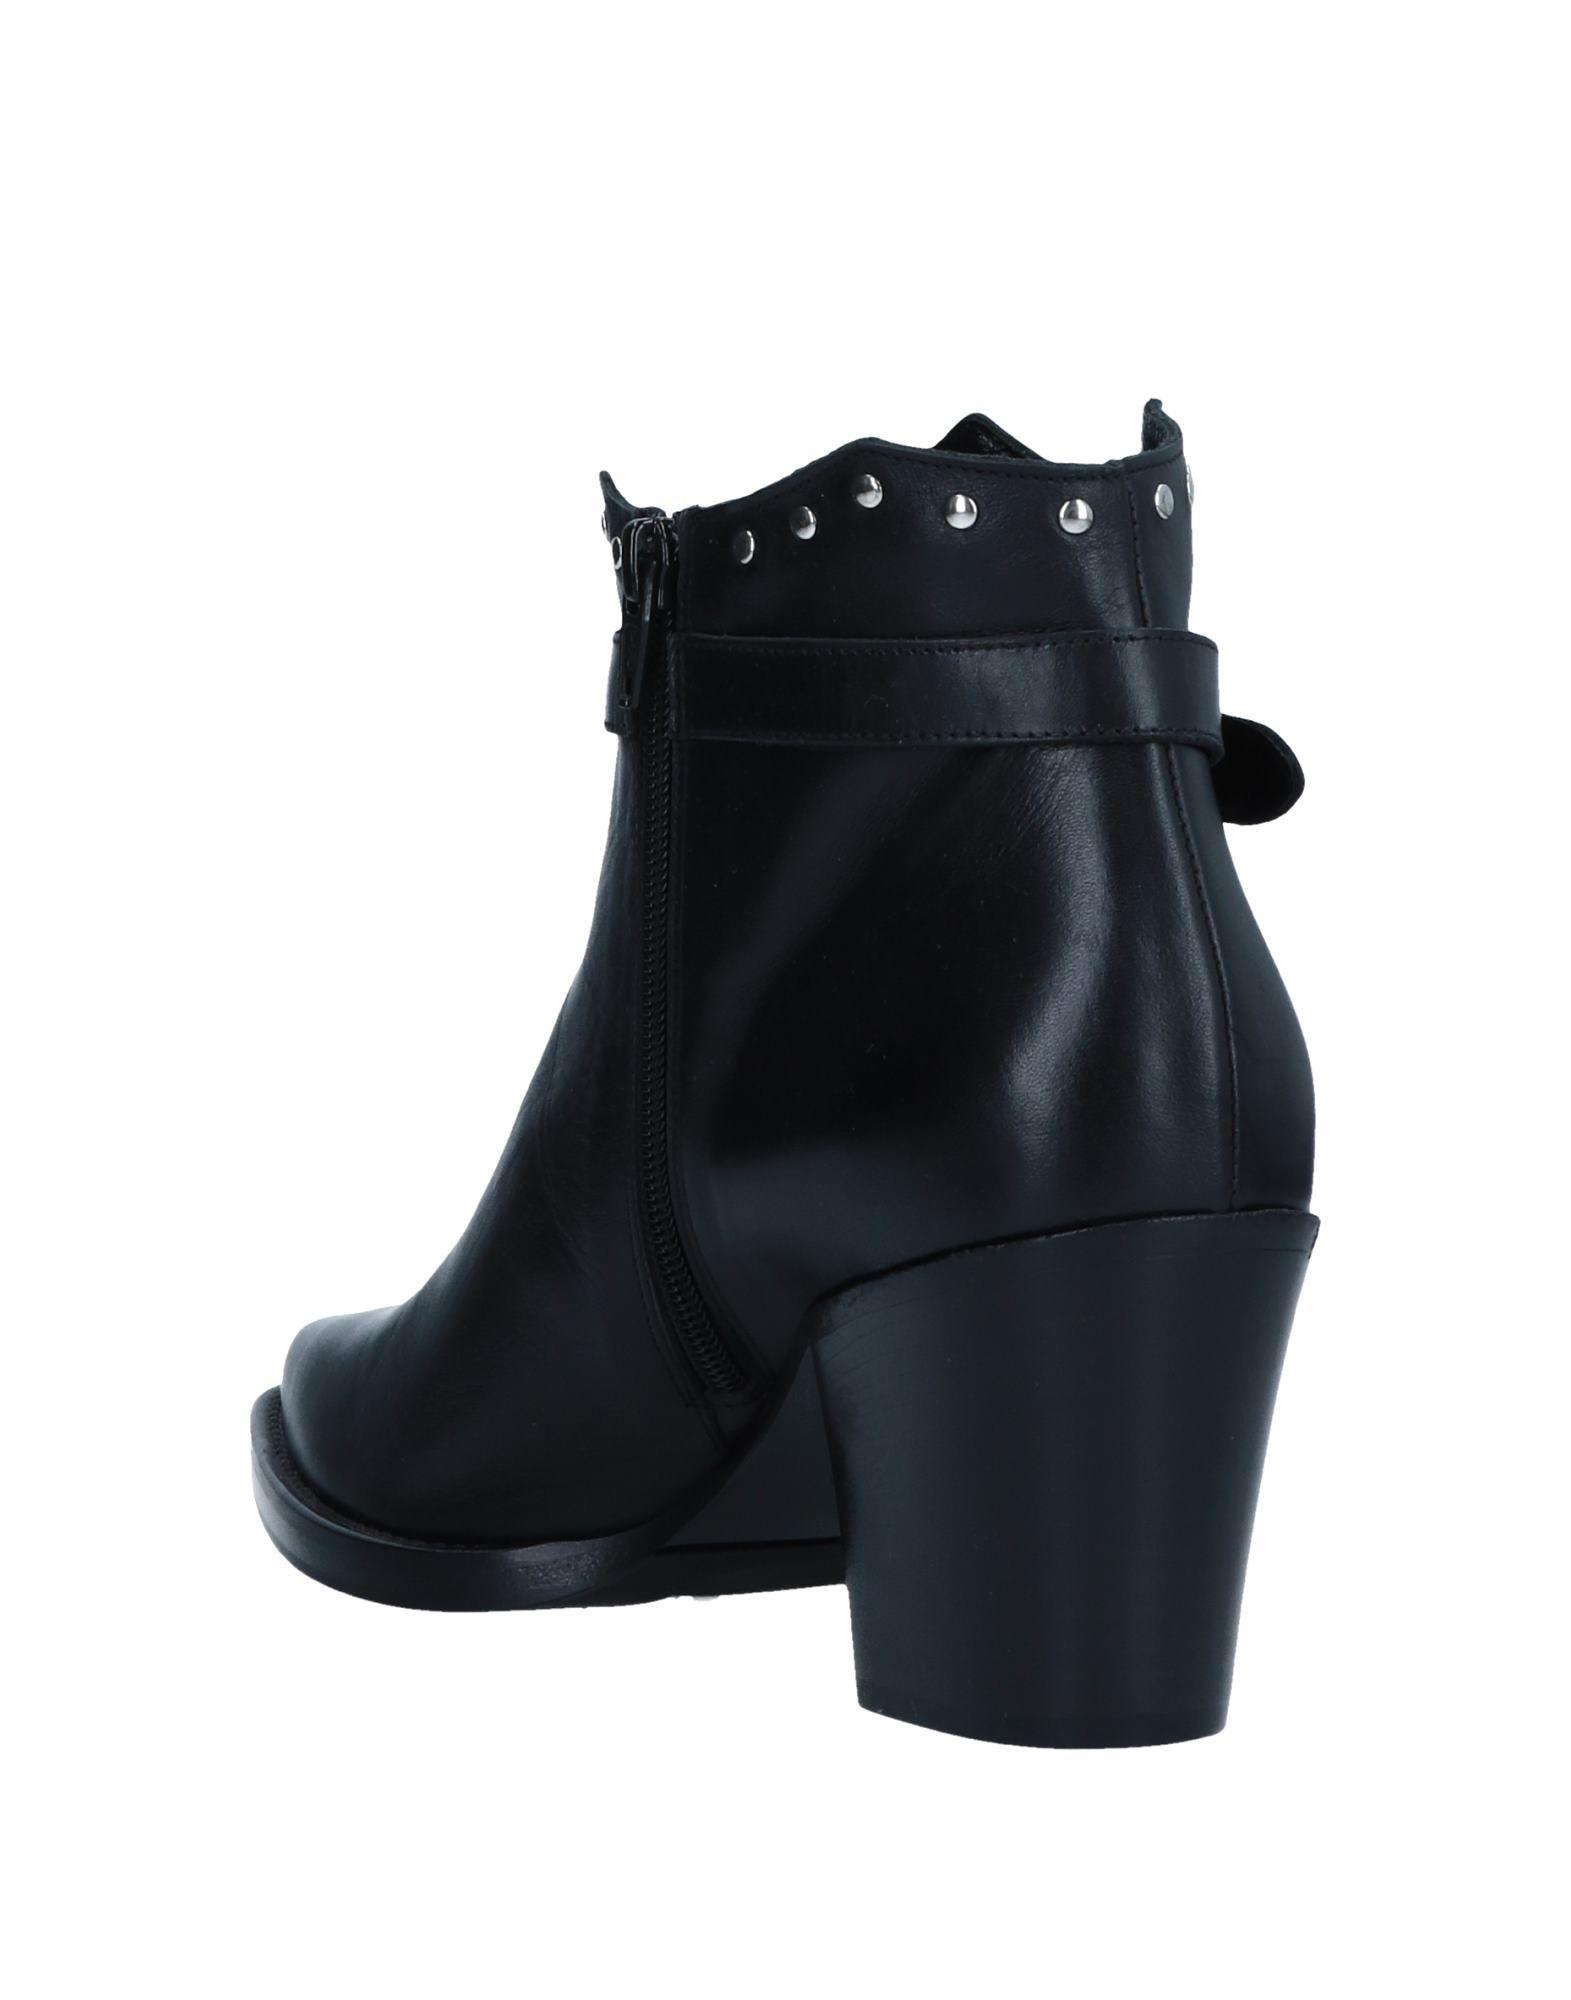 Stilvolle billige Schuhe Porta Borsari 11547020LF Stiefelette Damen  11547020LF Borsari 92e2ae